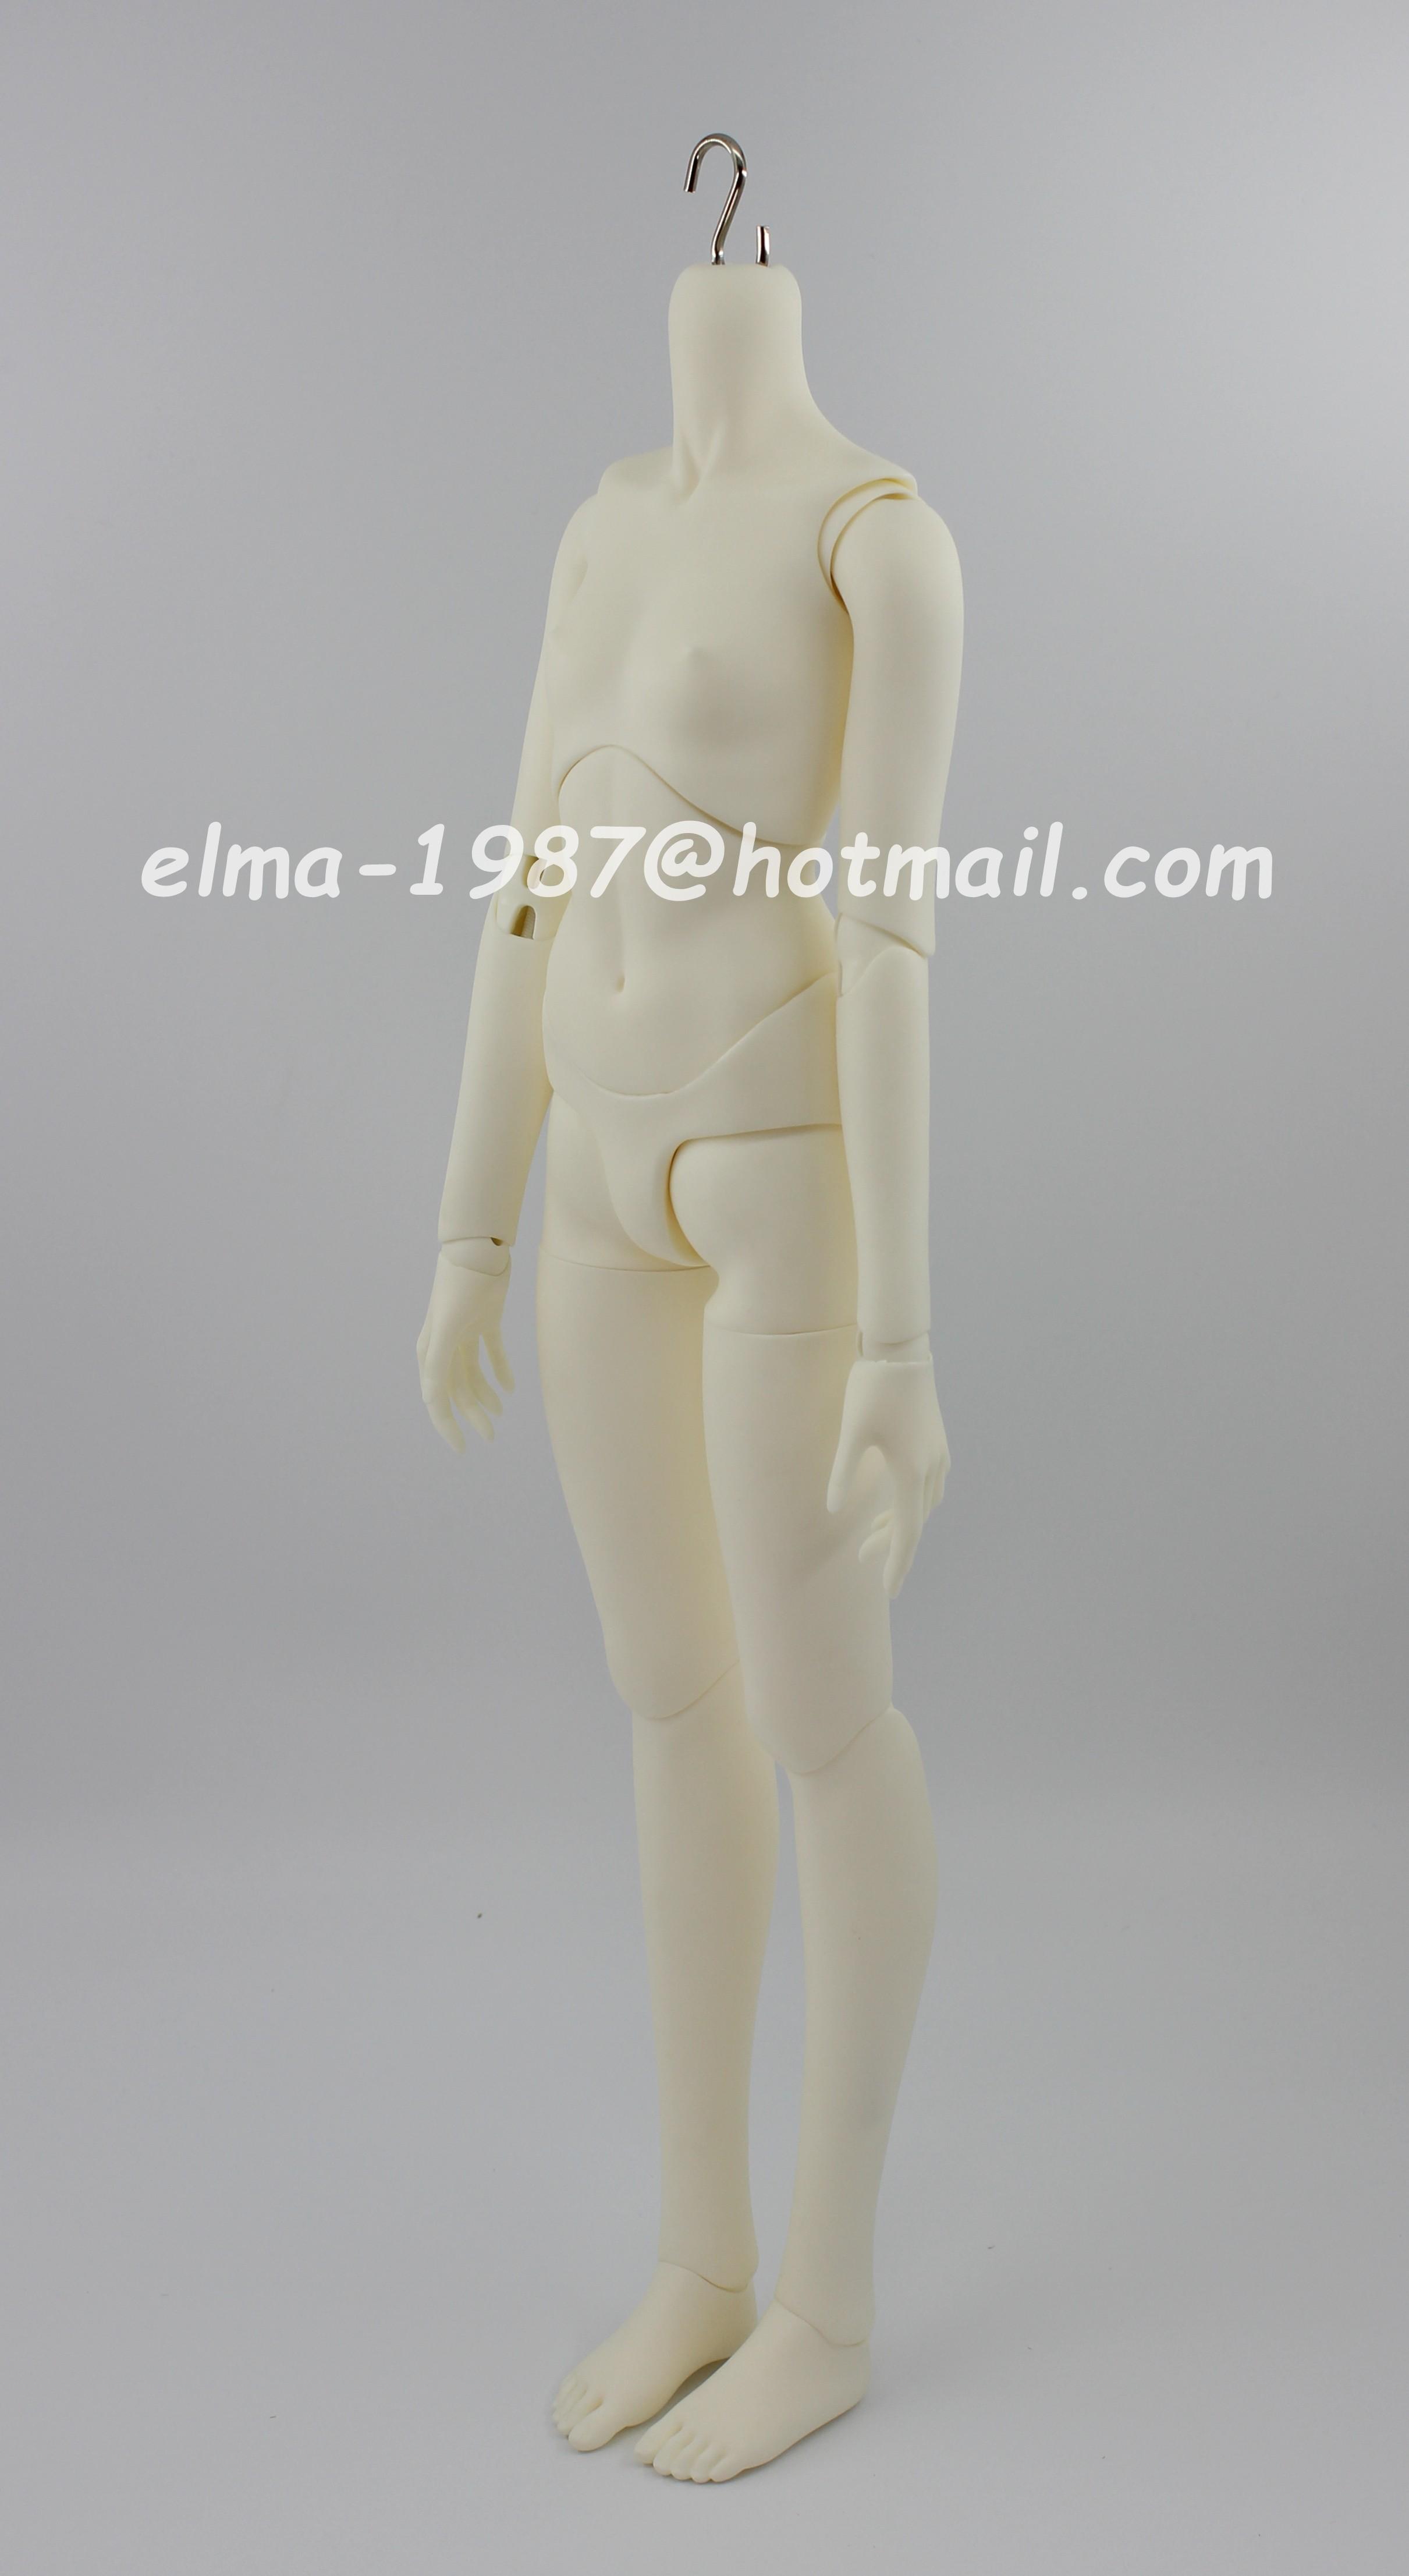 sdgr-flat-feet-small-breasts-body-2